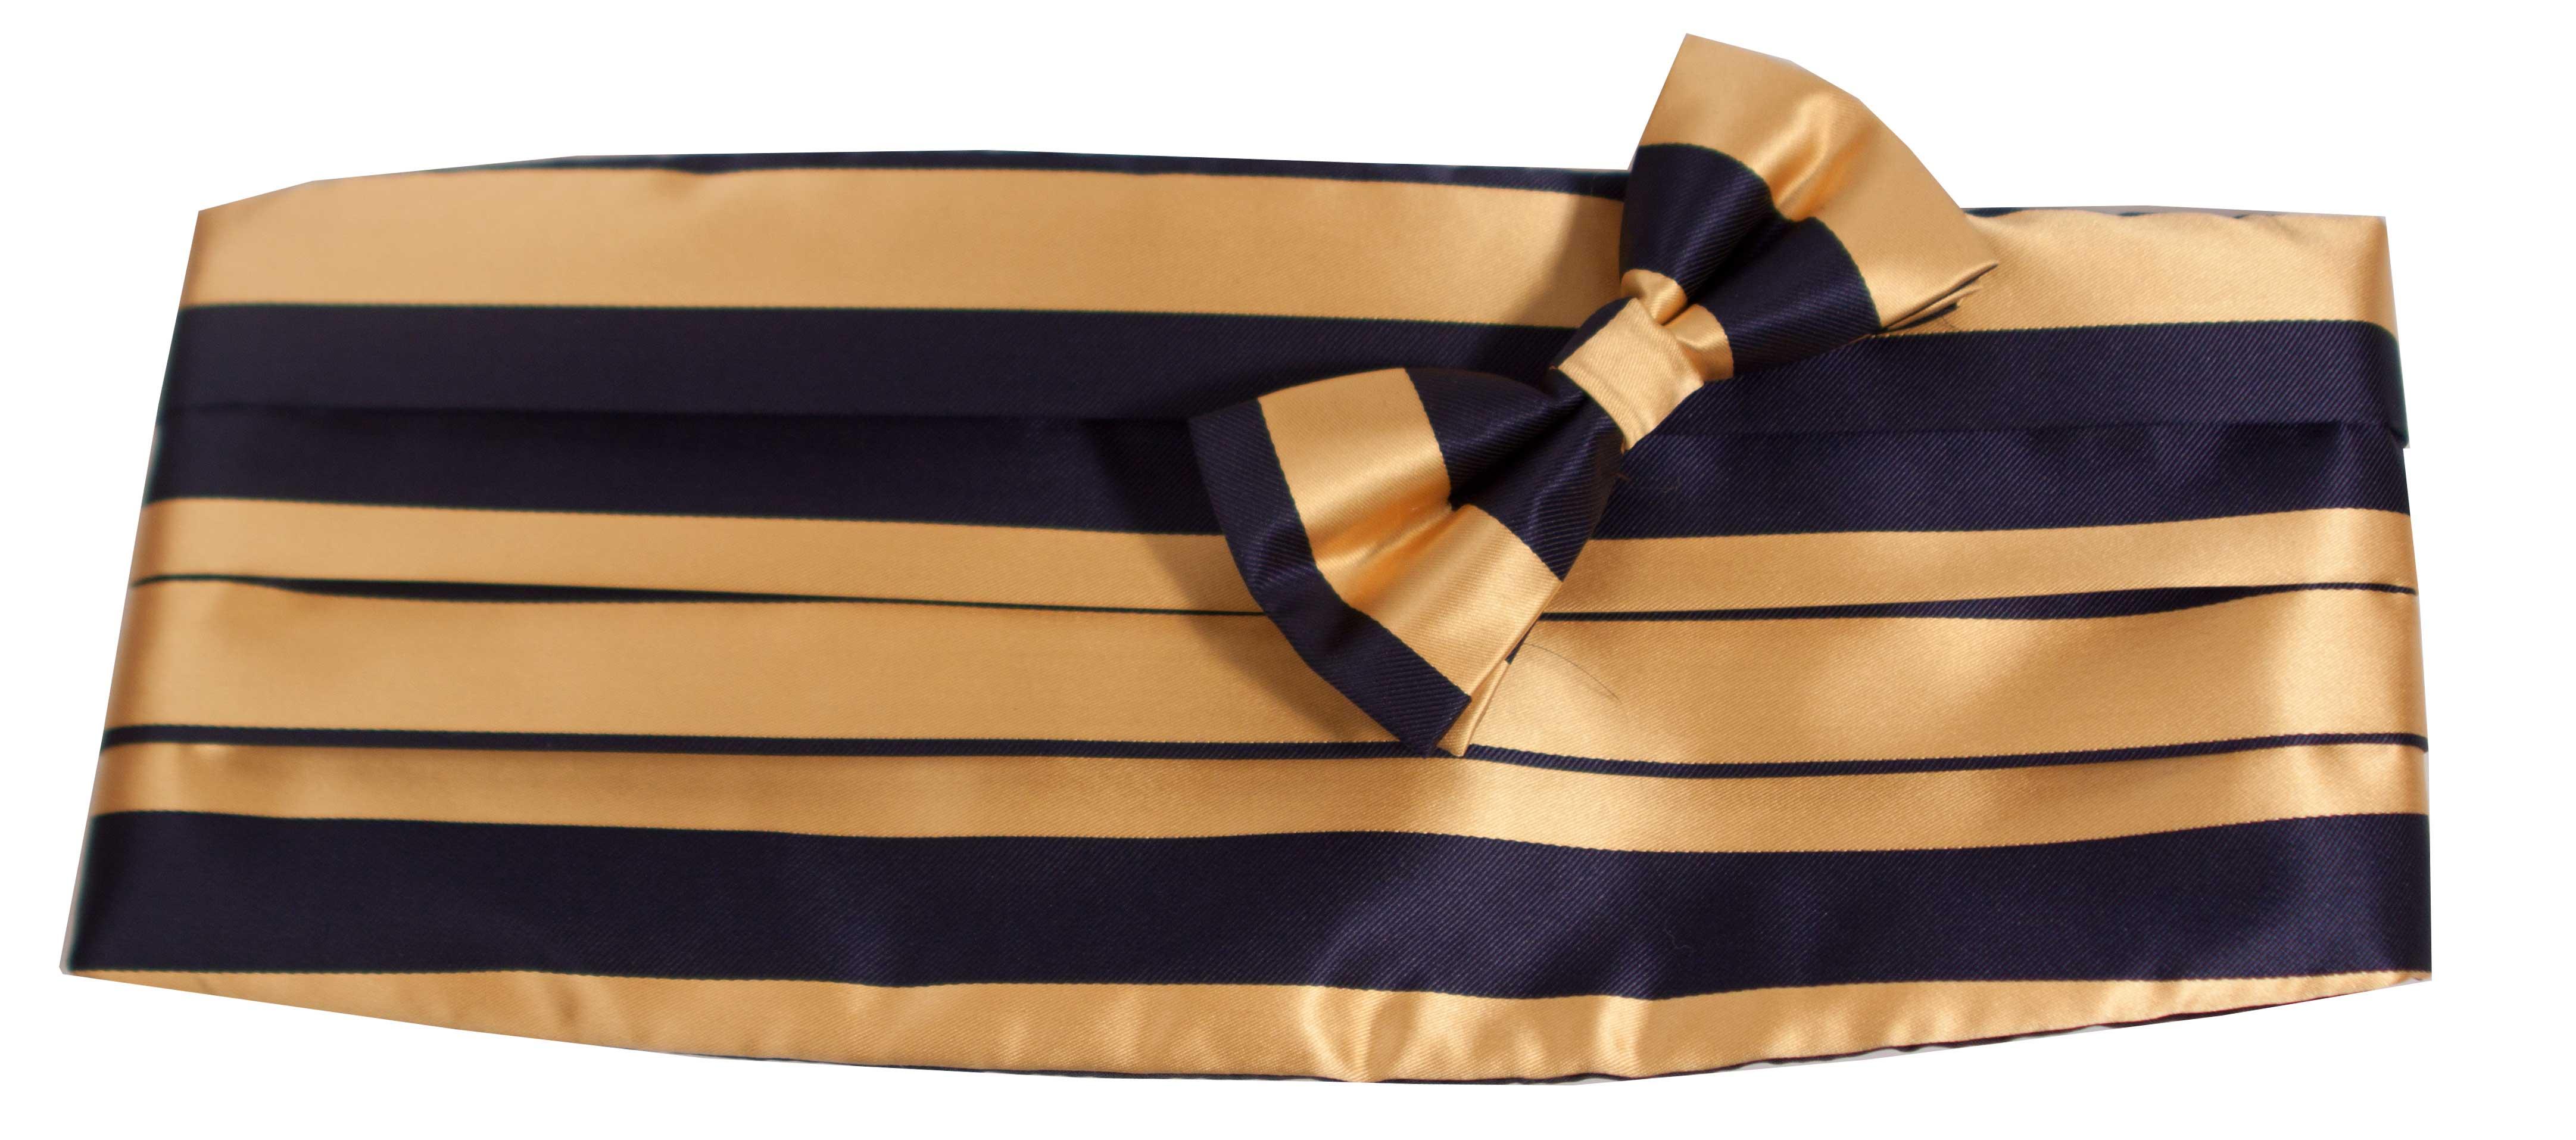 Cumberband (blue and yellow)